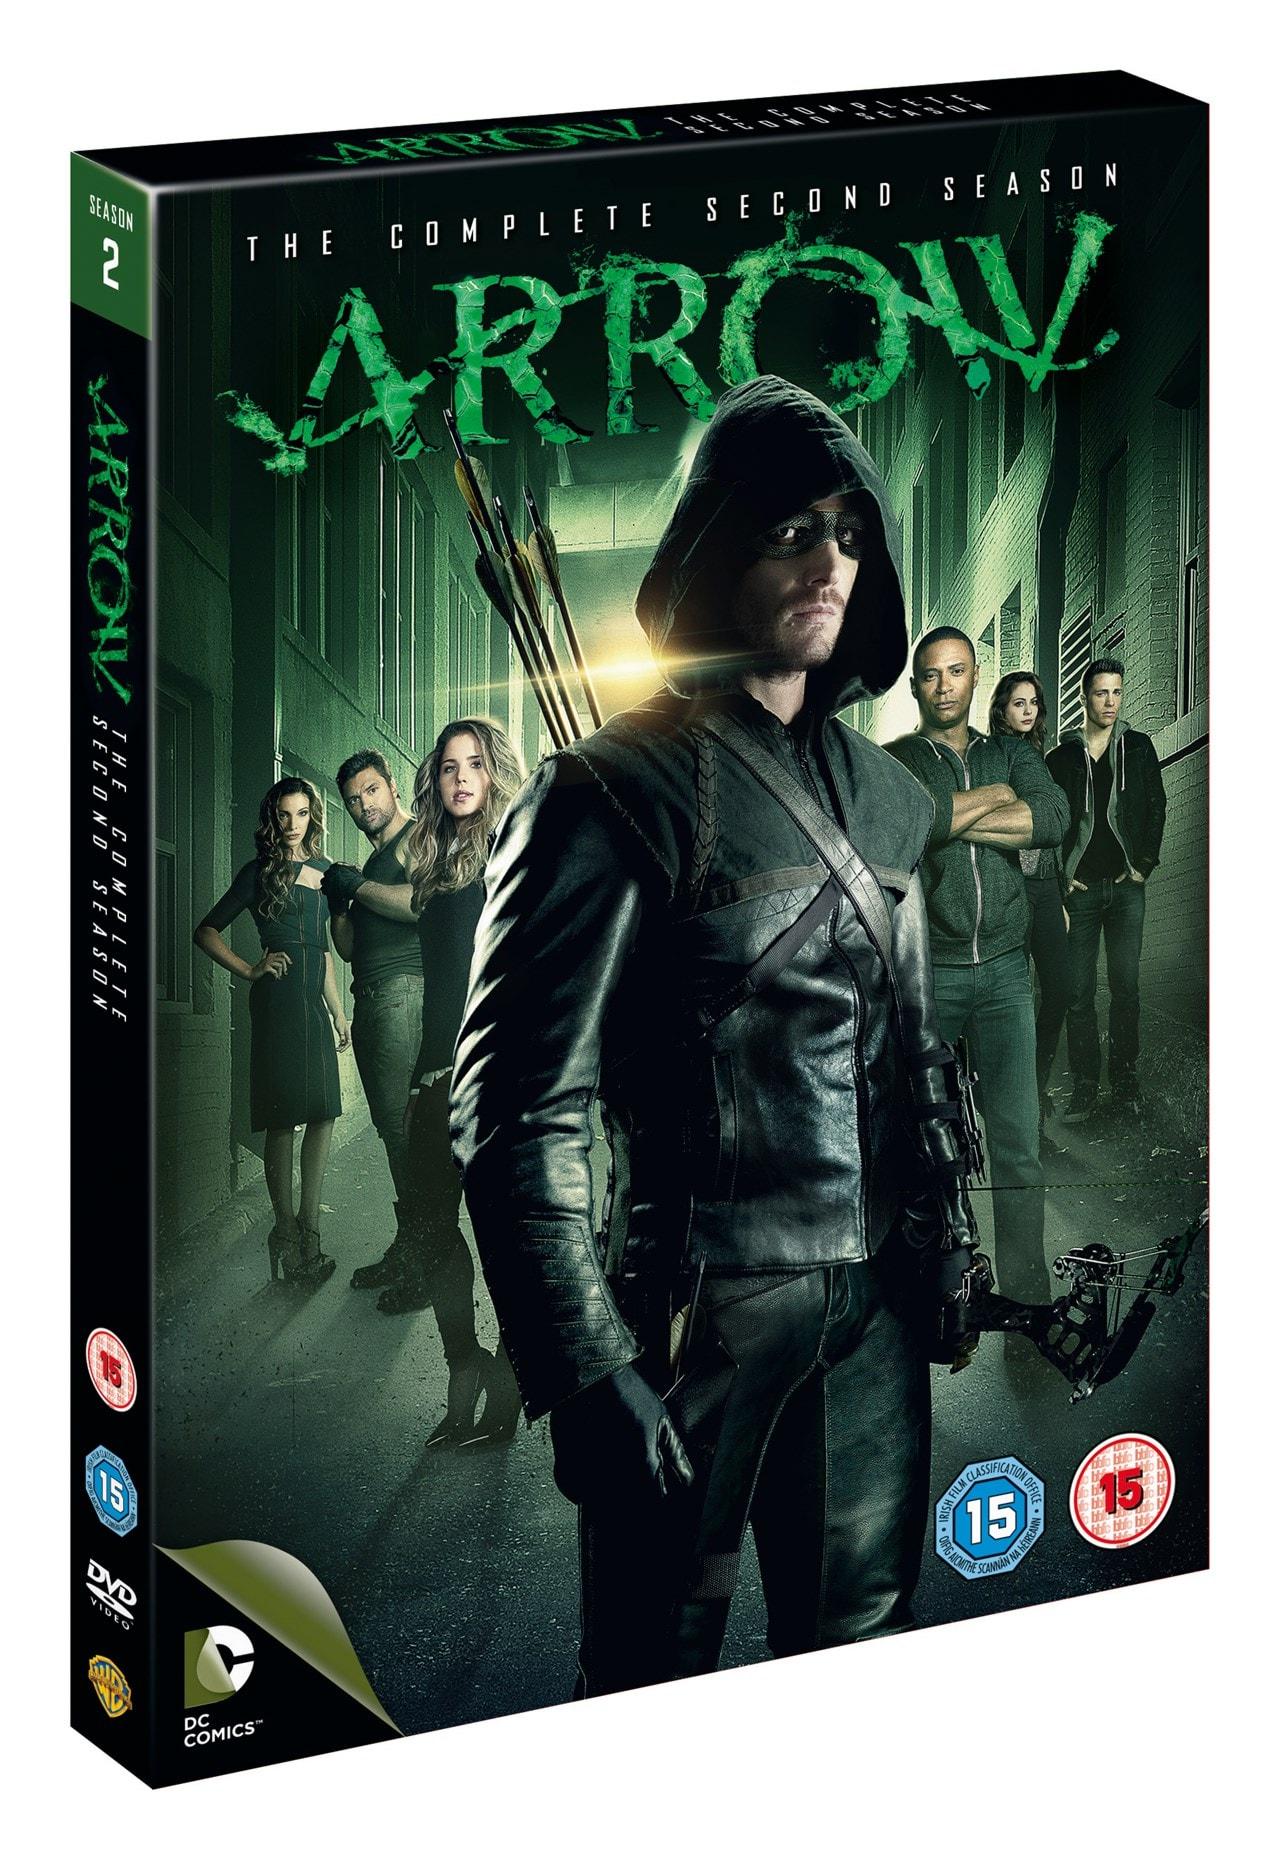 Arrow: The Complete Second Season - 2